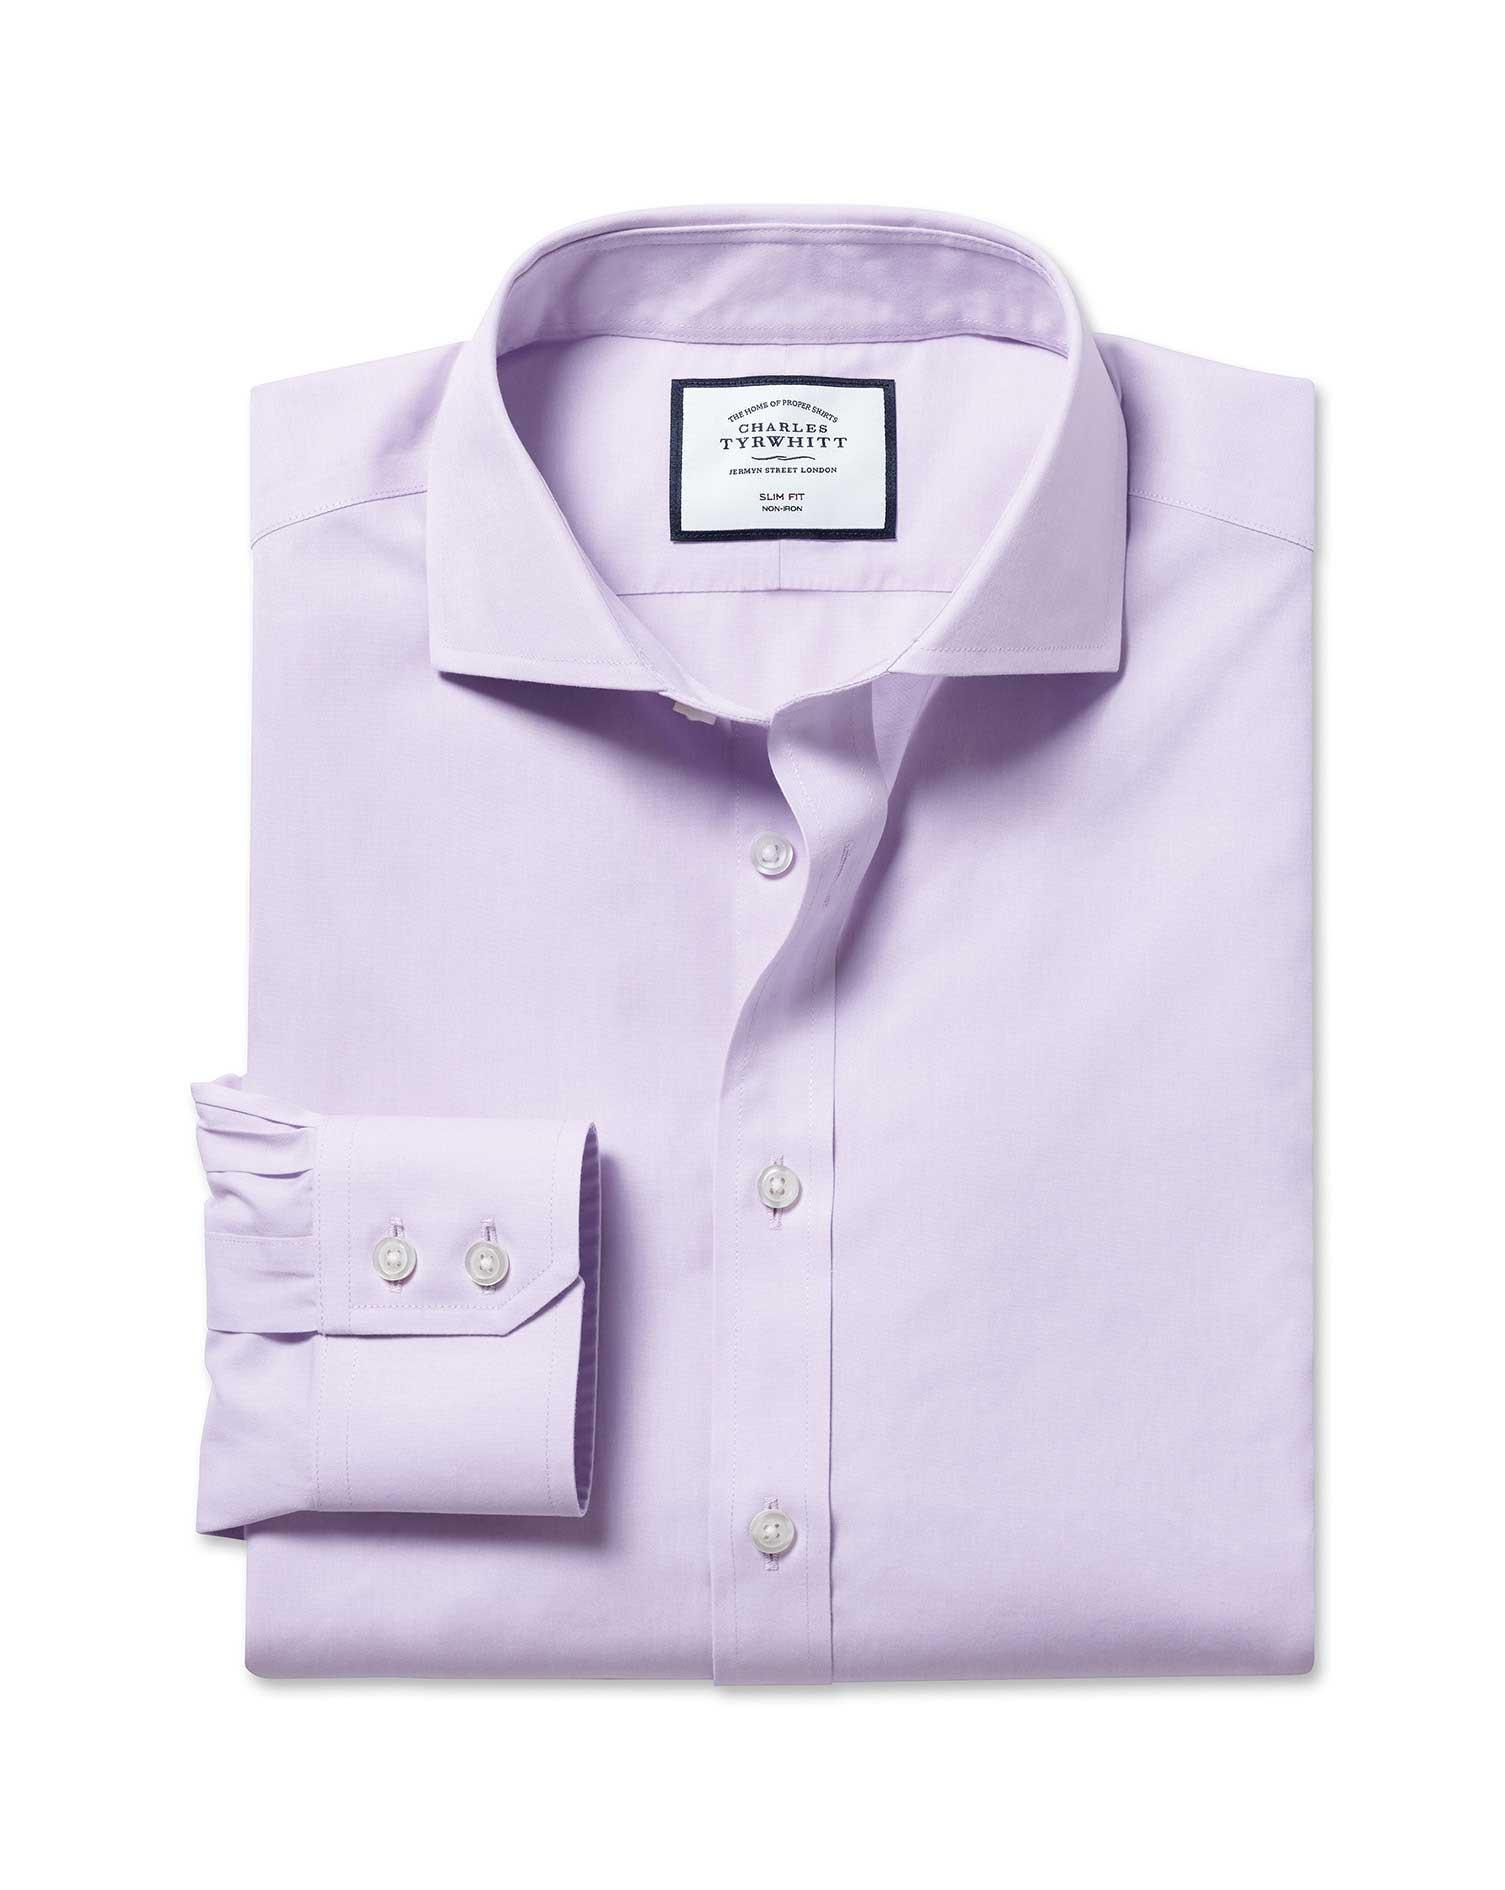 Slim Fit Non-Iron Cutaway Collar Poplin Lilac Cotton Formal Shirt Single Cuff Size 16/32 by Charles